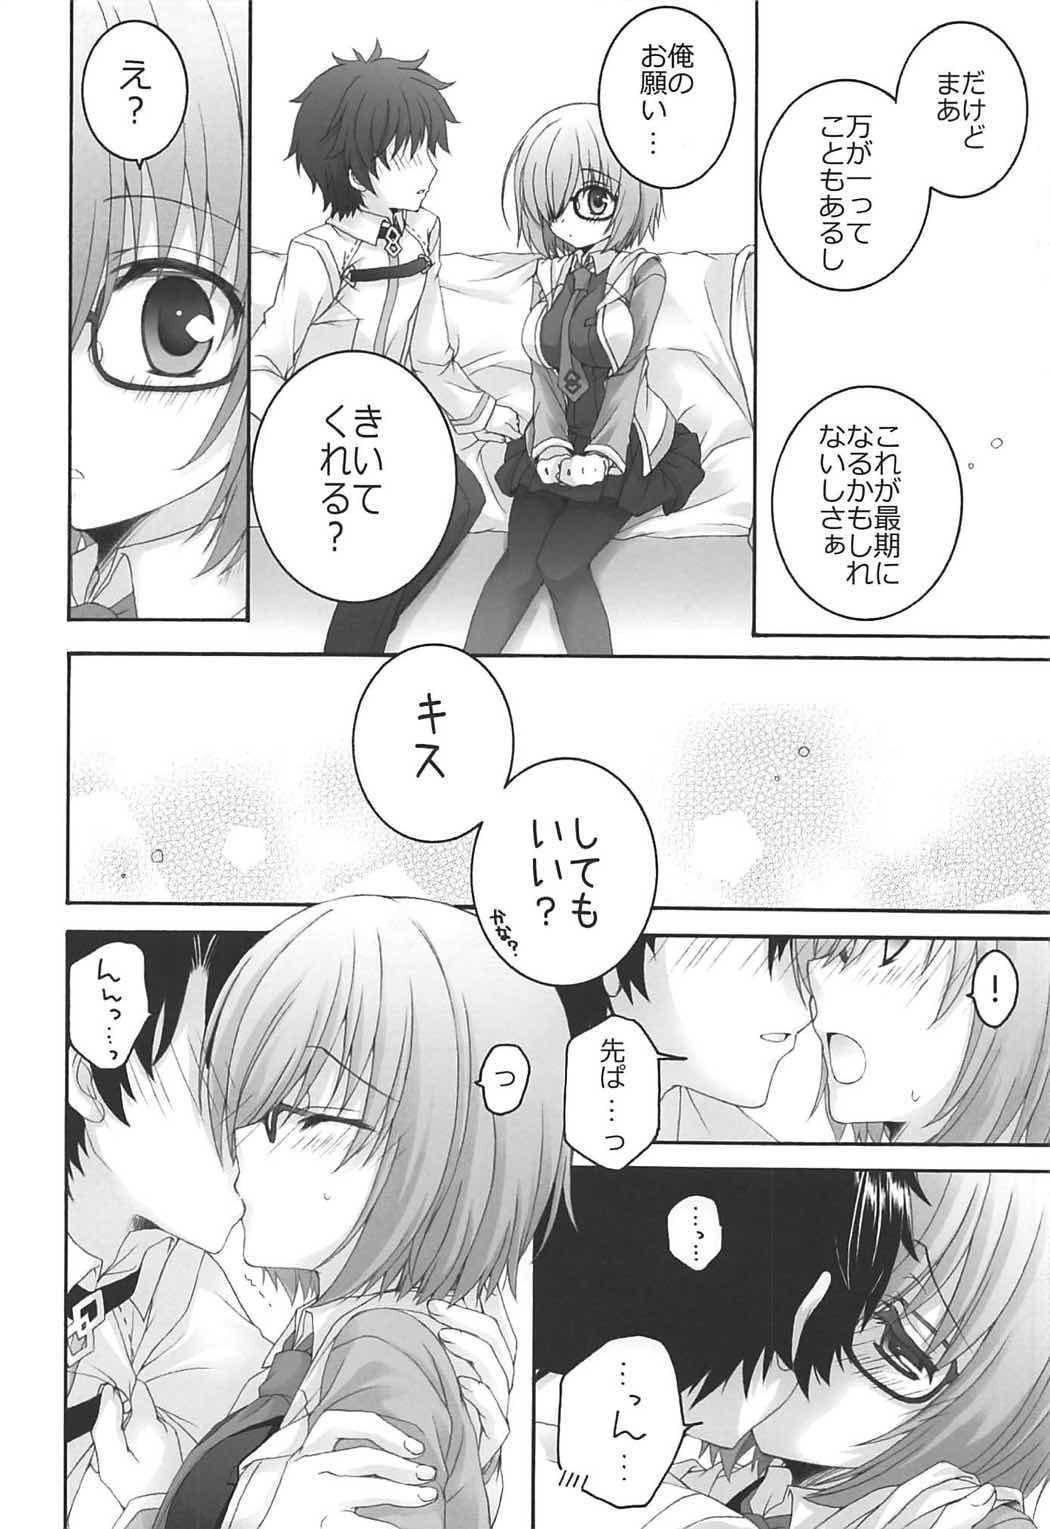 (COMIC1☆11) [Pyonpyororin (Akoko.)] - 1 day ago - (Fate/Grand Order) 8